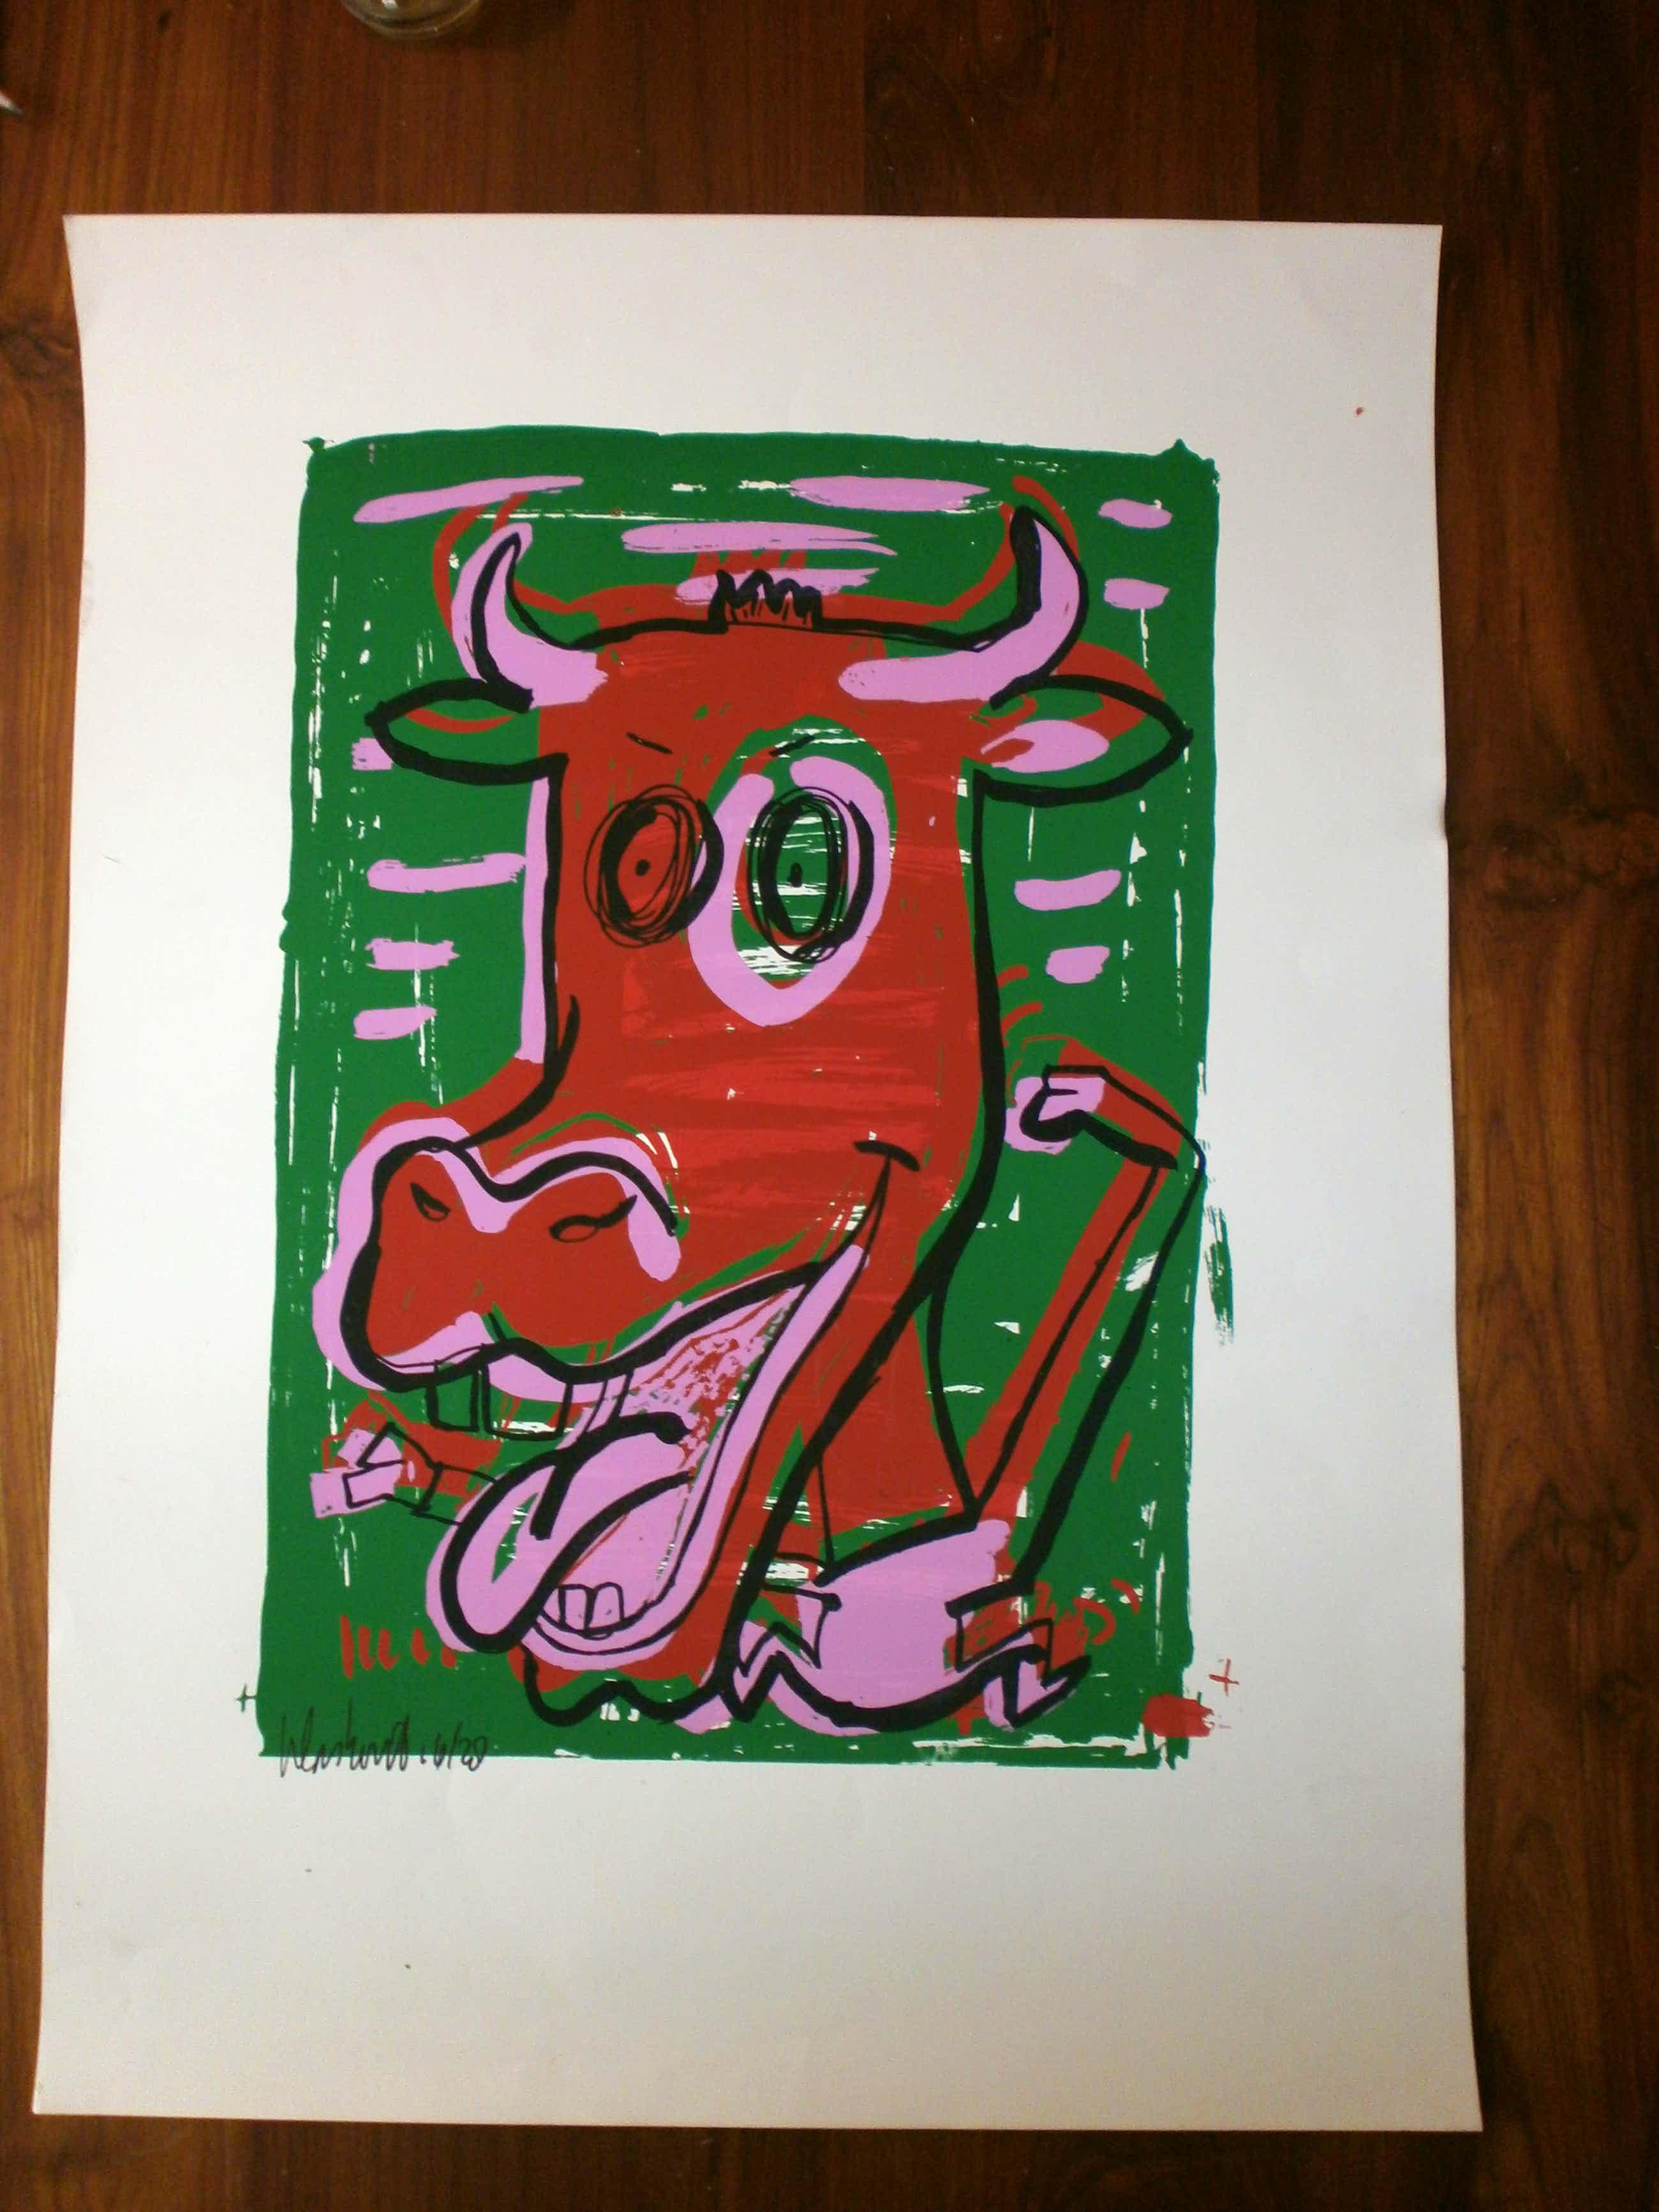 Peter Klashorst - mad cow green [beperkte oplage] kopen? Bied vanaf 35!